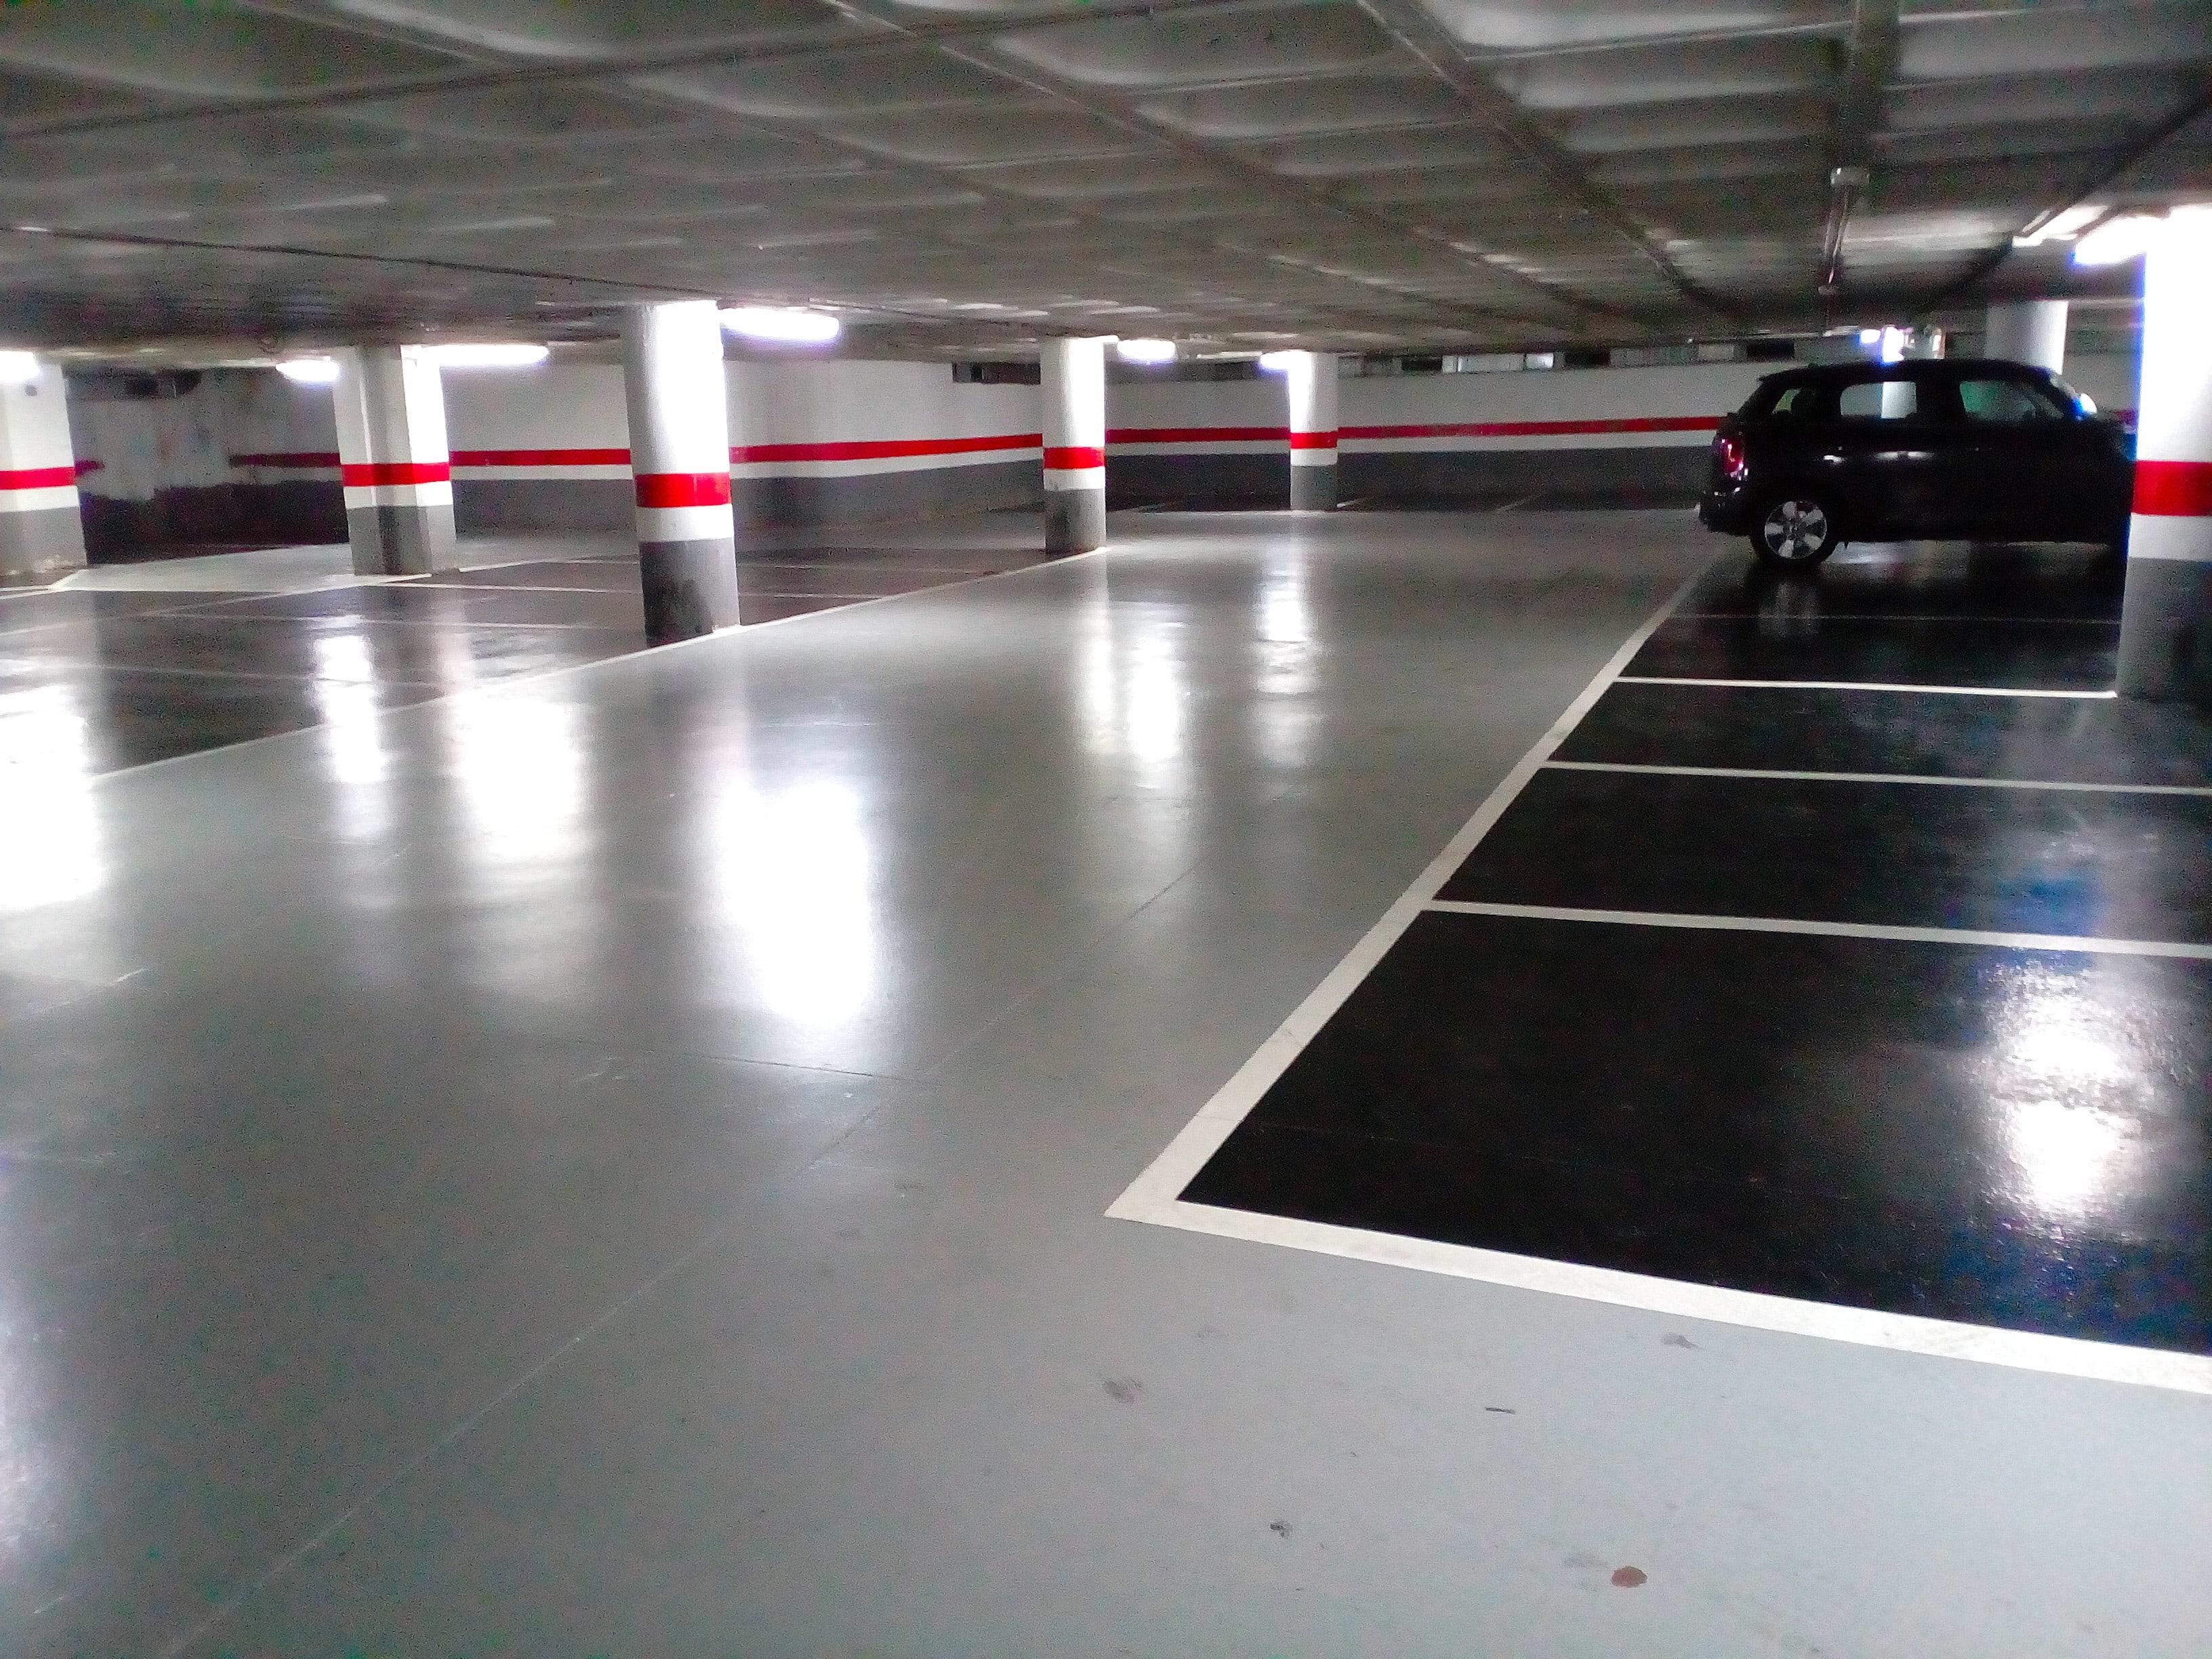 Pinturas de poliuretano para parking